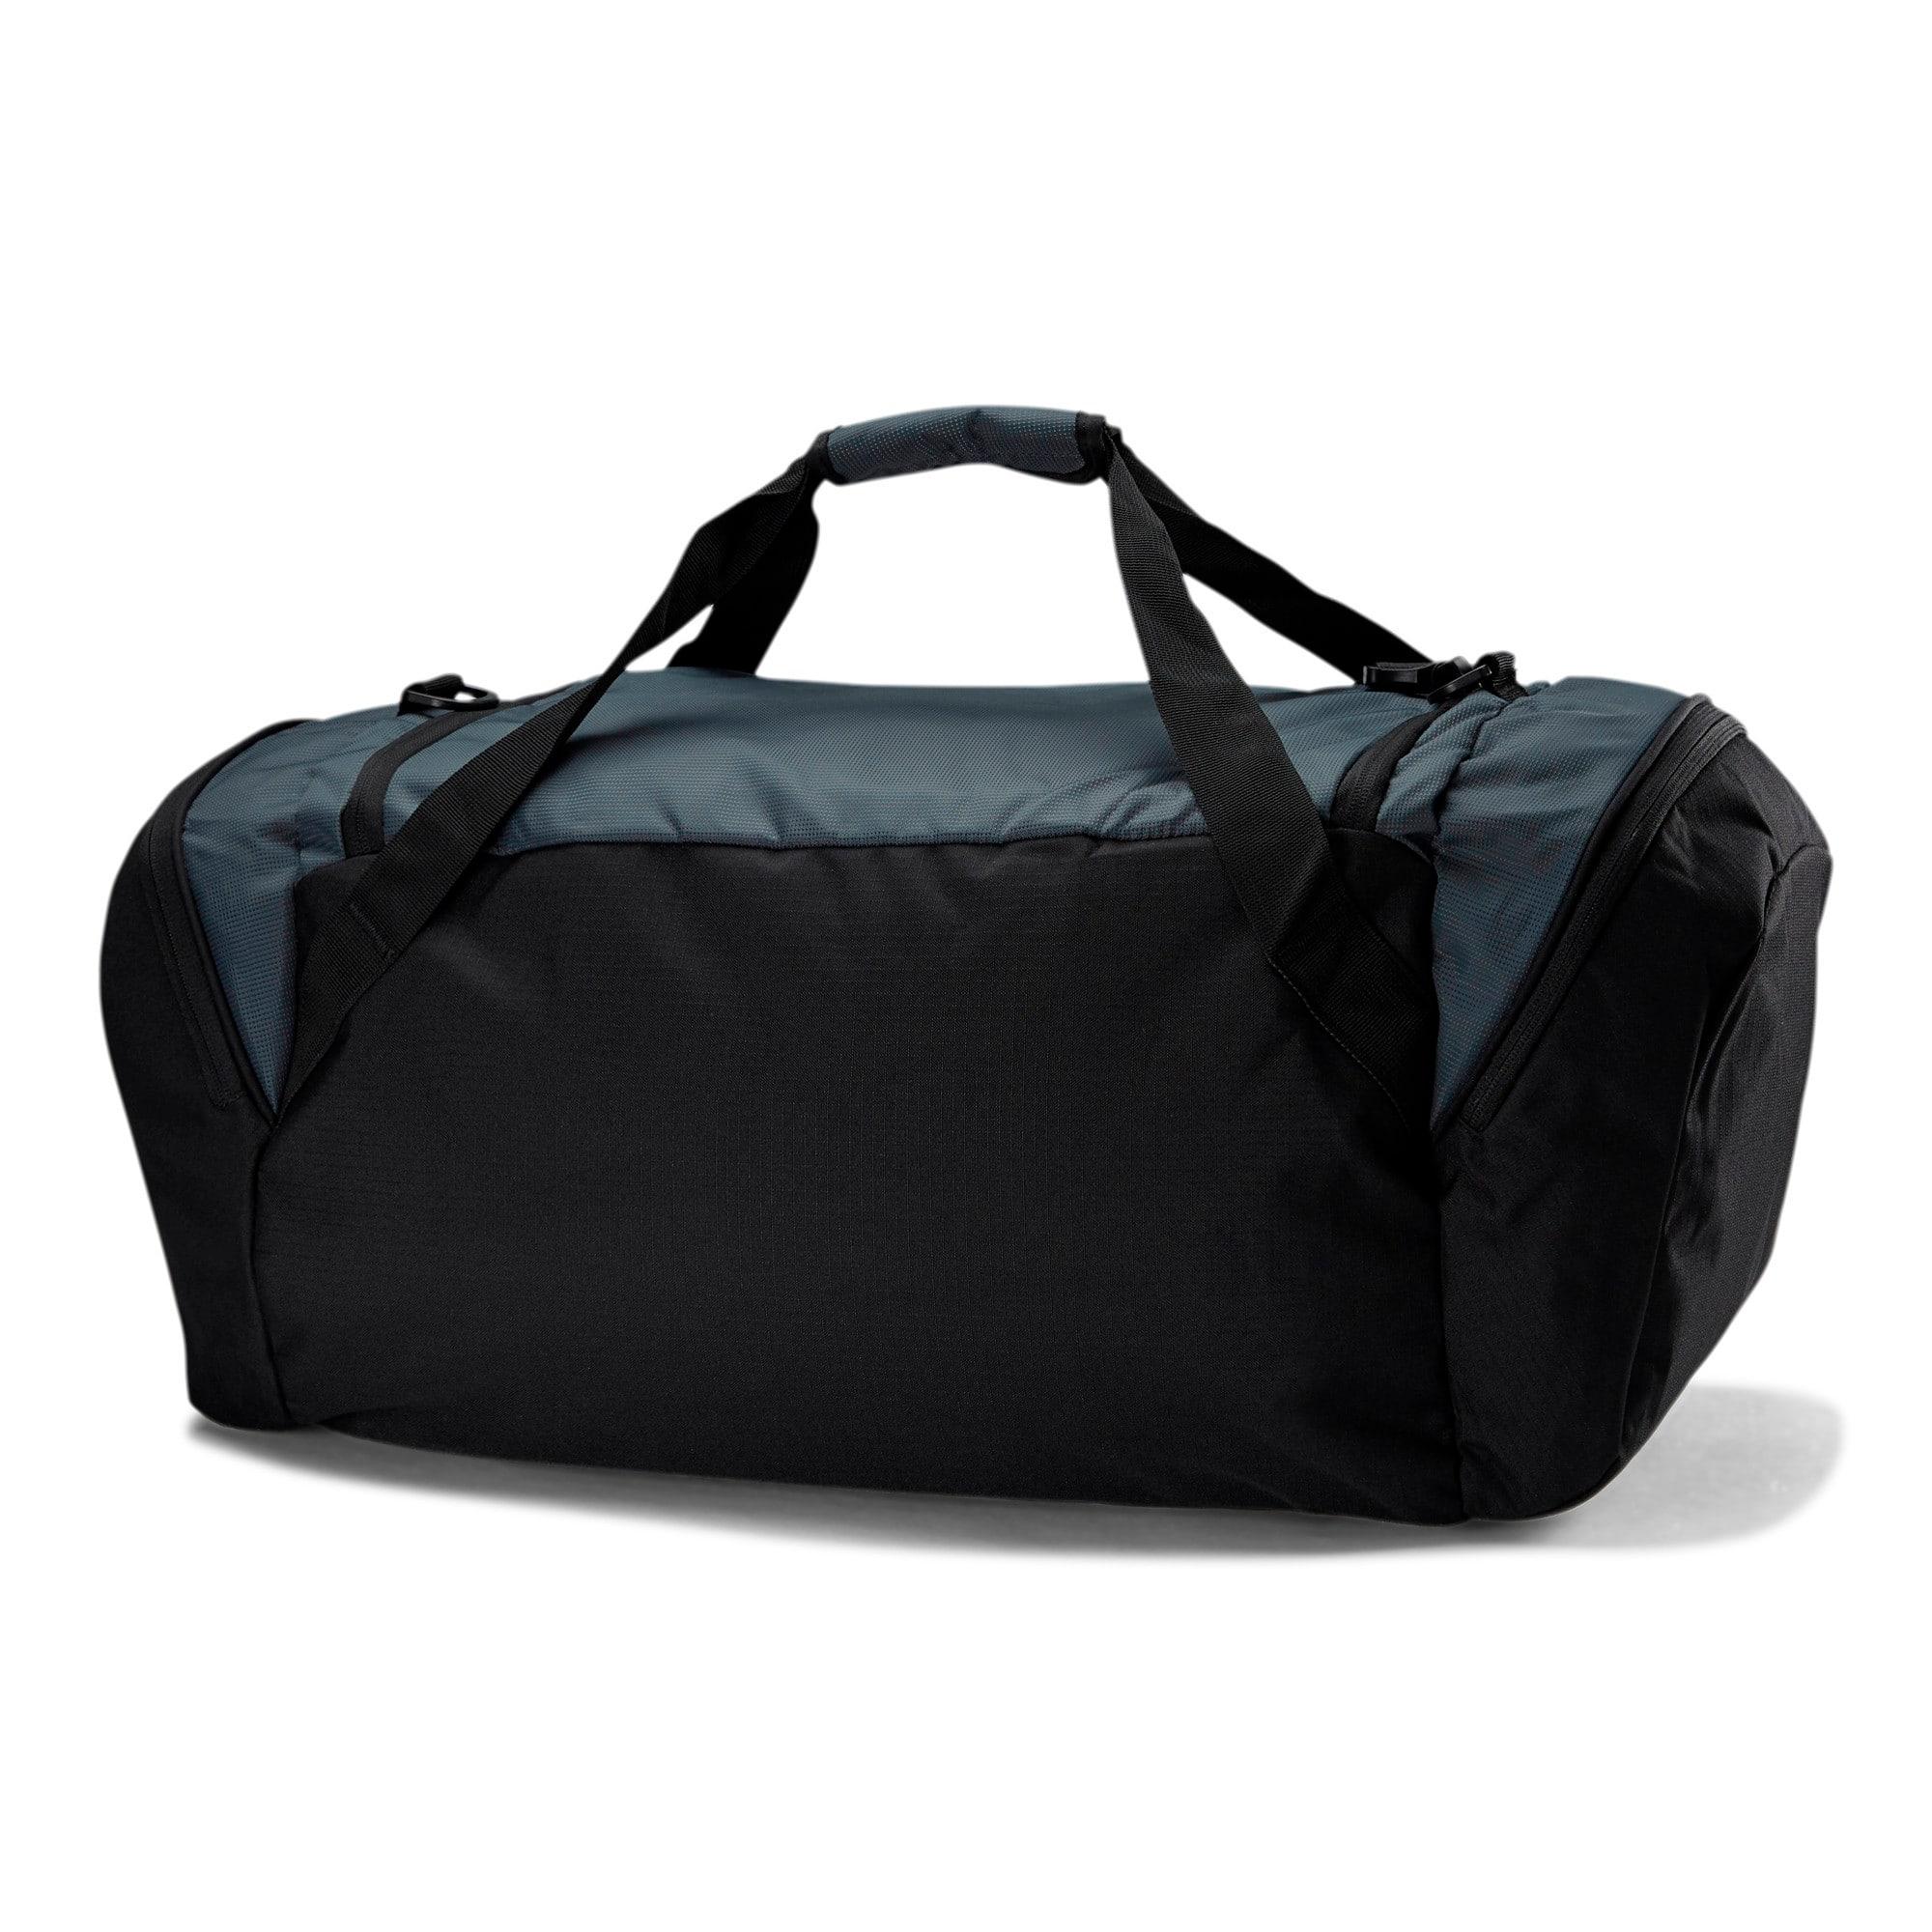 "Thumbnail 2 of Formation 2.0 24"" Duffel Bag, Grey/Black, medium"